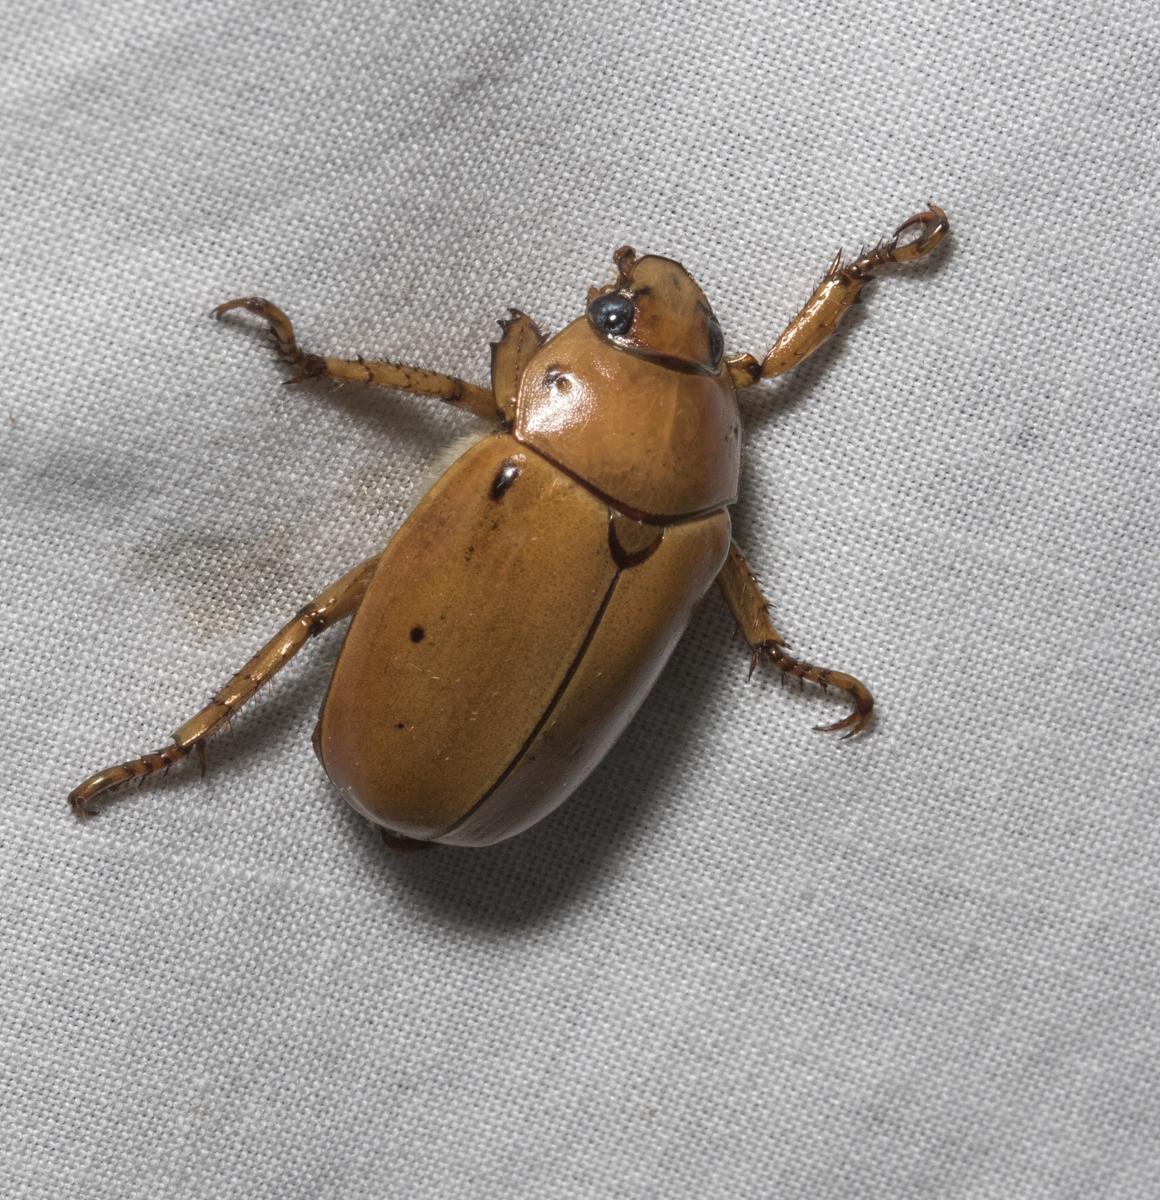 Grapevine Beetle, Pelidnota punctata